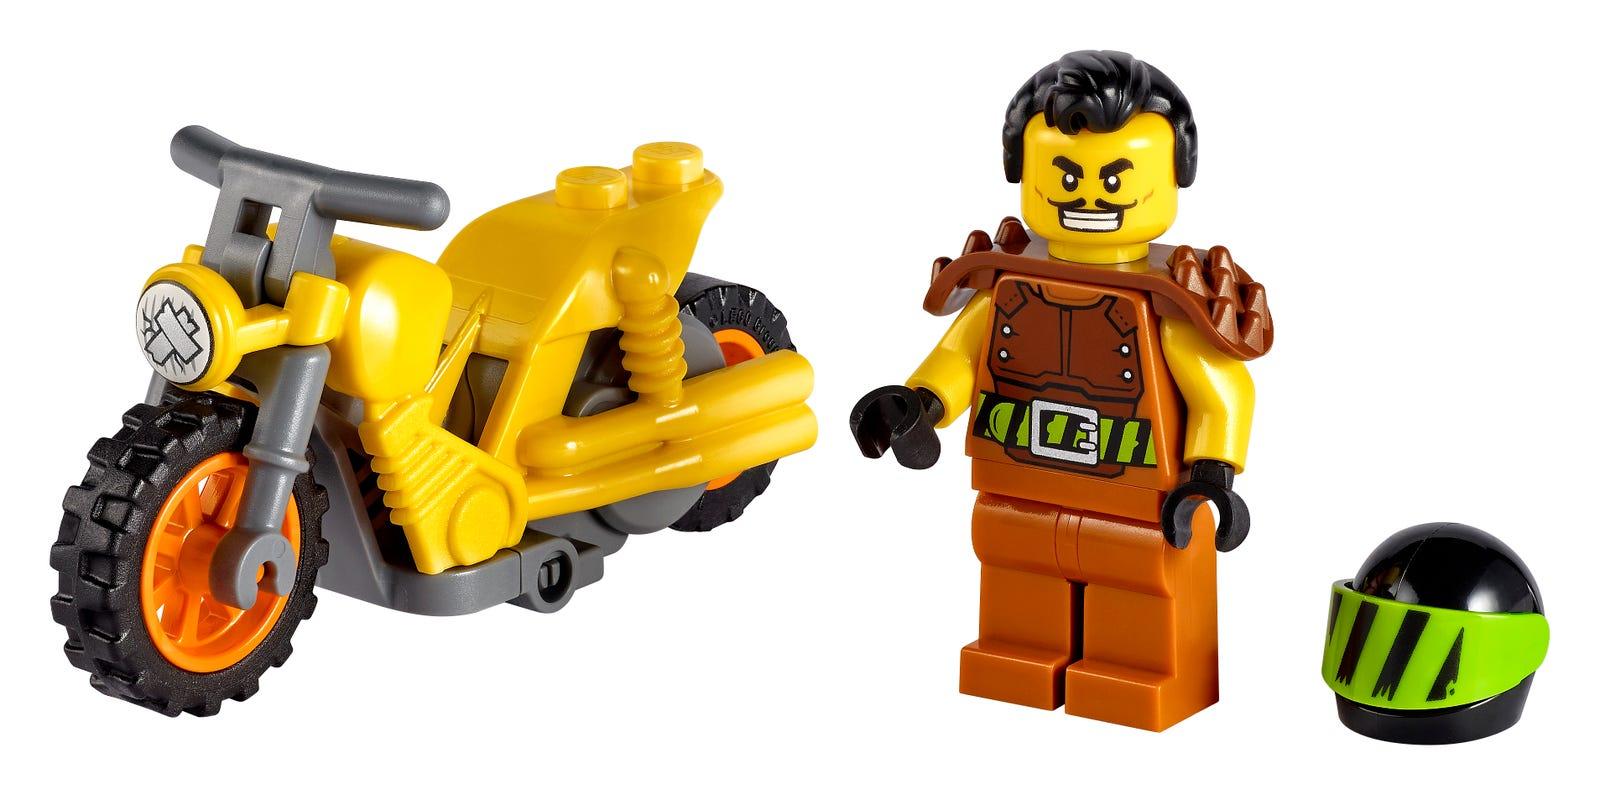 LEGO introduces flywheel-powered bikes with LEGO City Stuntz sets 21